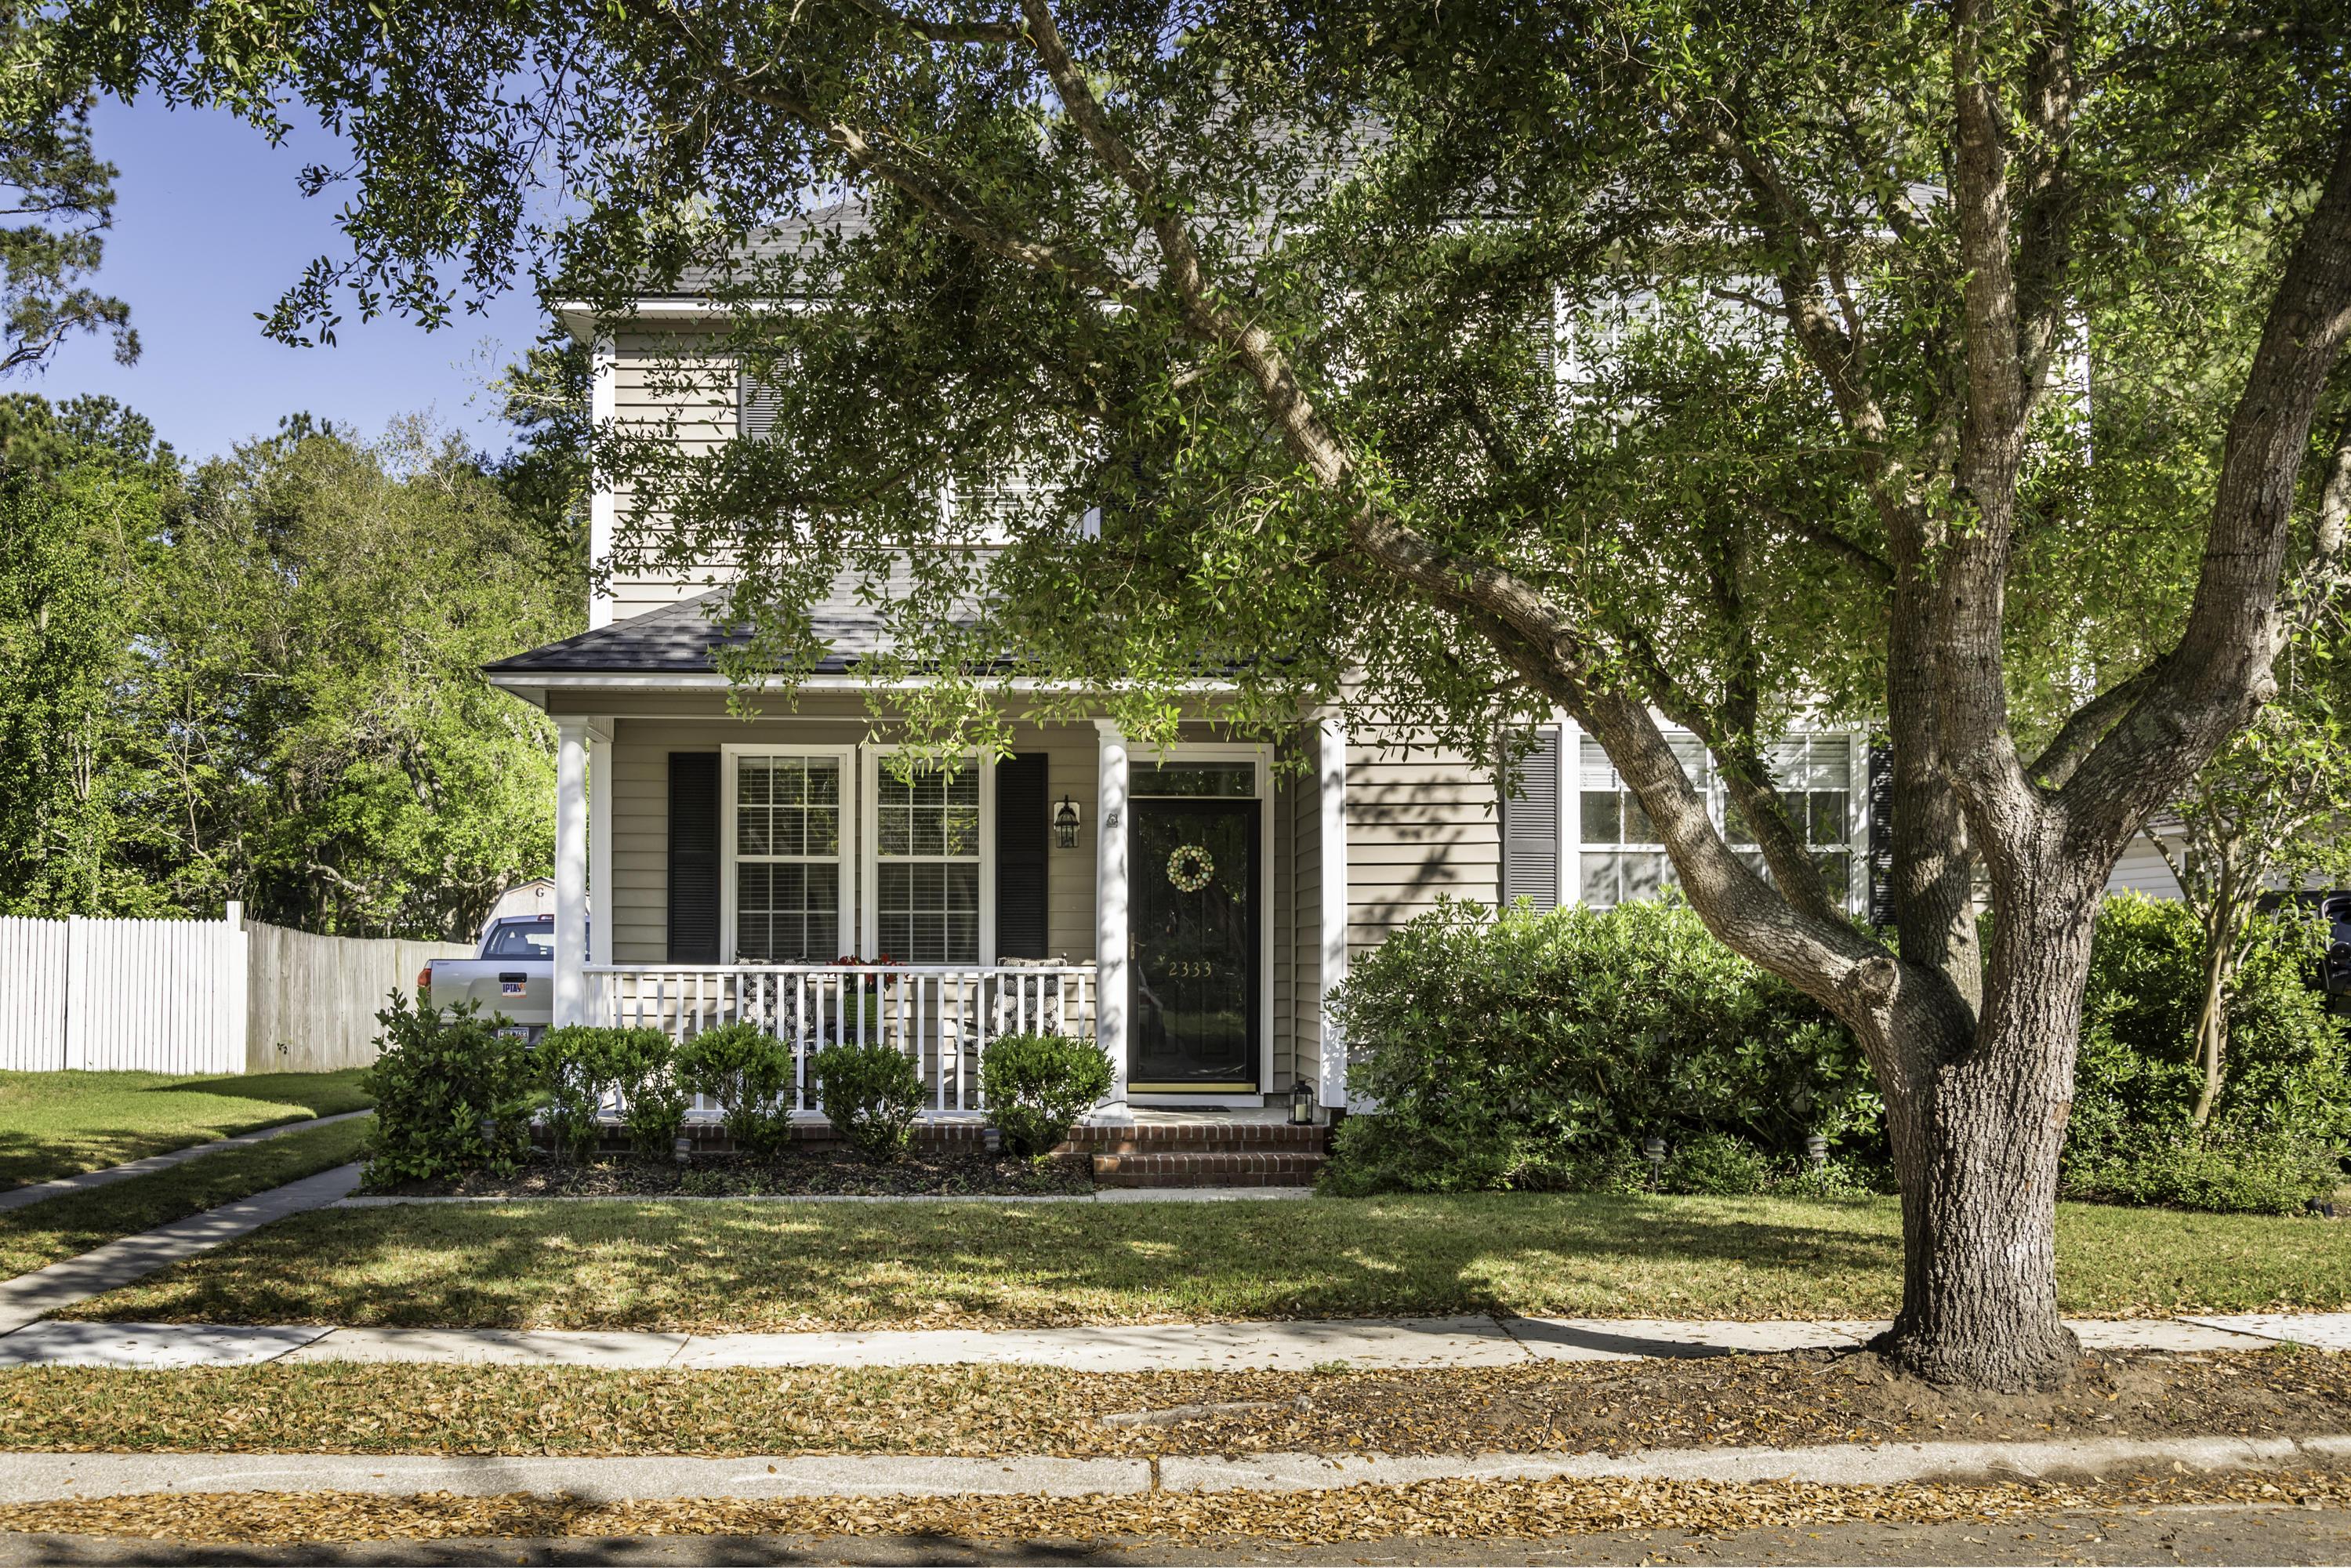 Chadbury Village Homes For Sale - 2333 Chadbury, Mount Pleasant, SC - 11